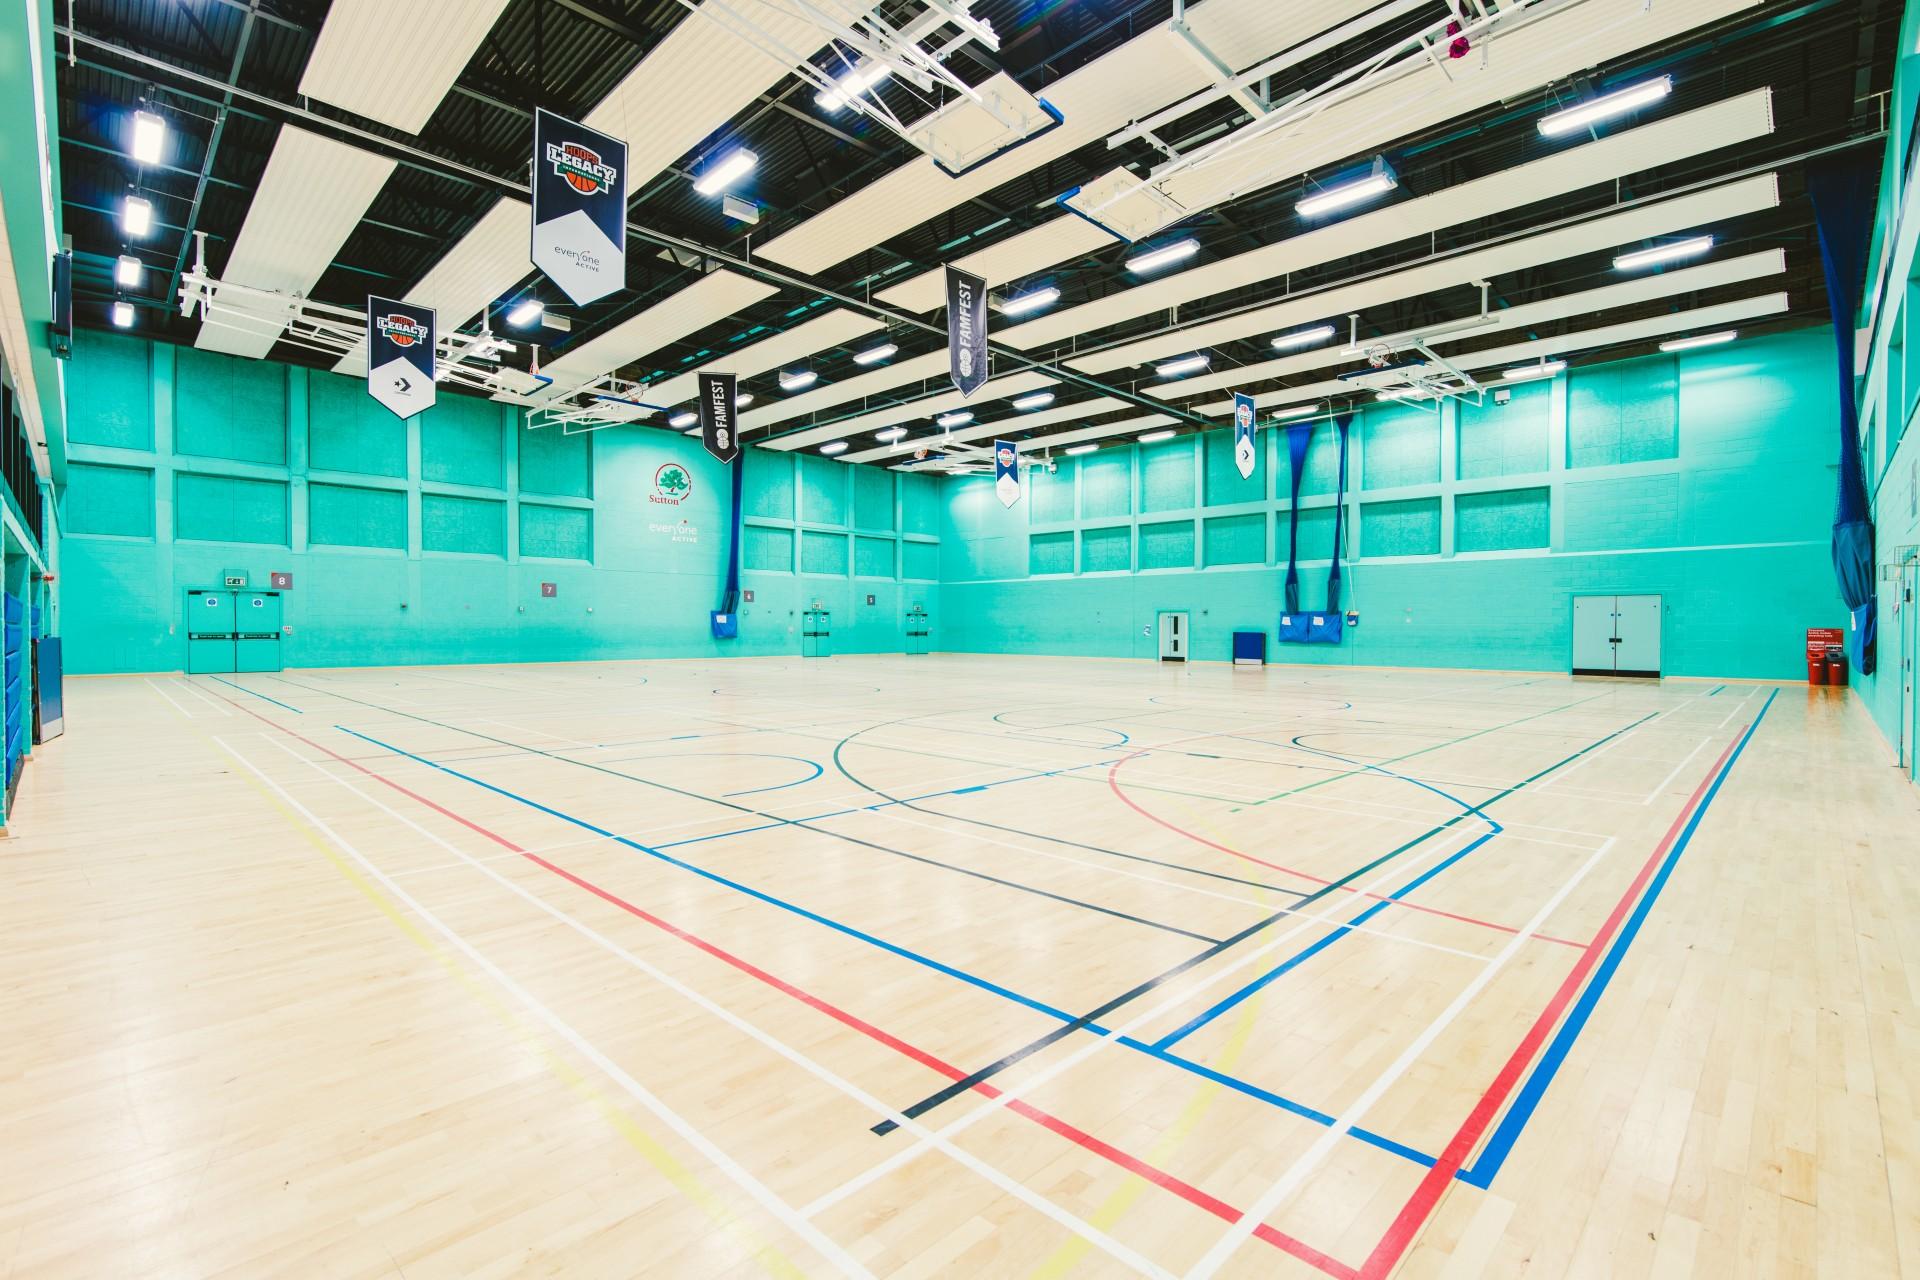 Westcroft Leisure Centre Events Venue In Surrey